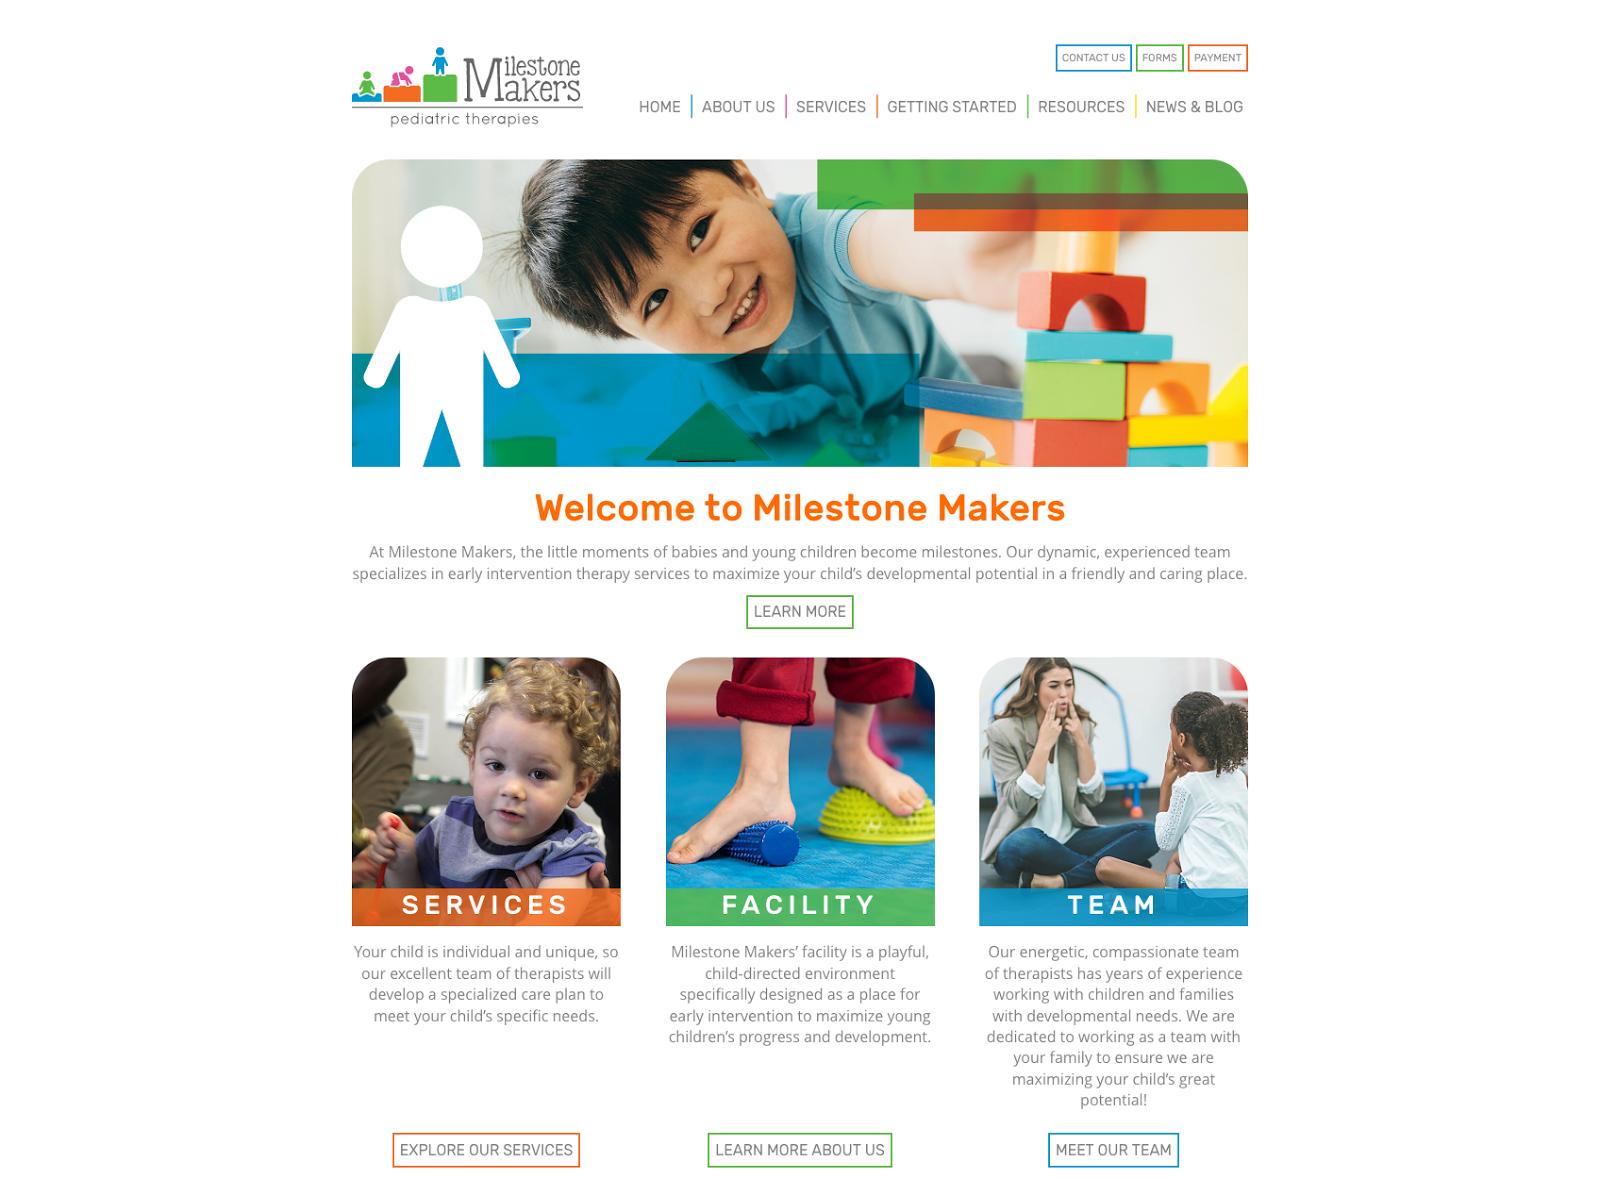 Milestone Makers Pediatric Therapies